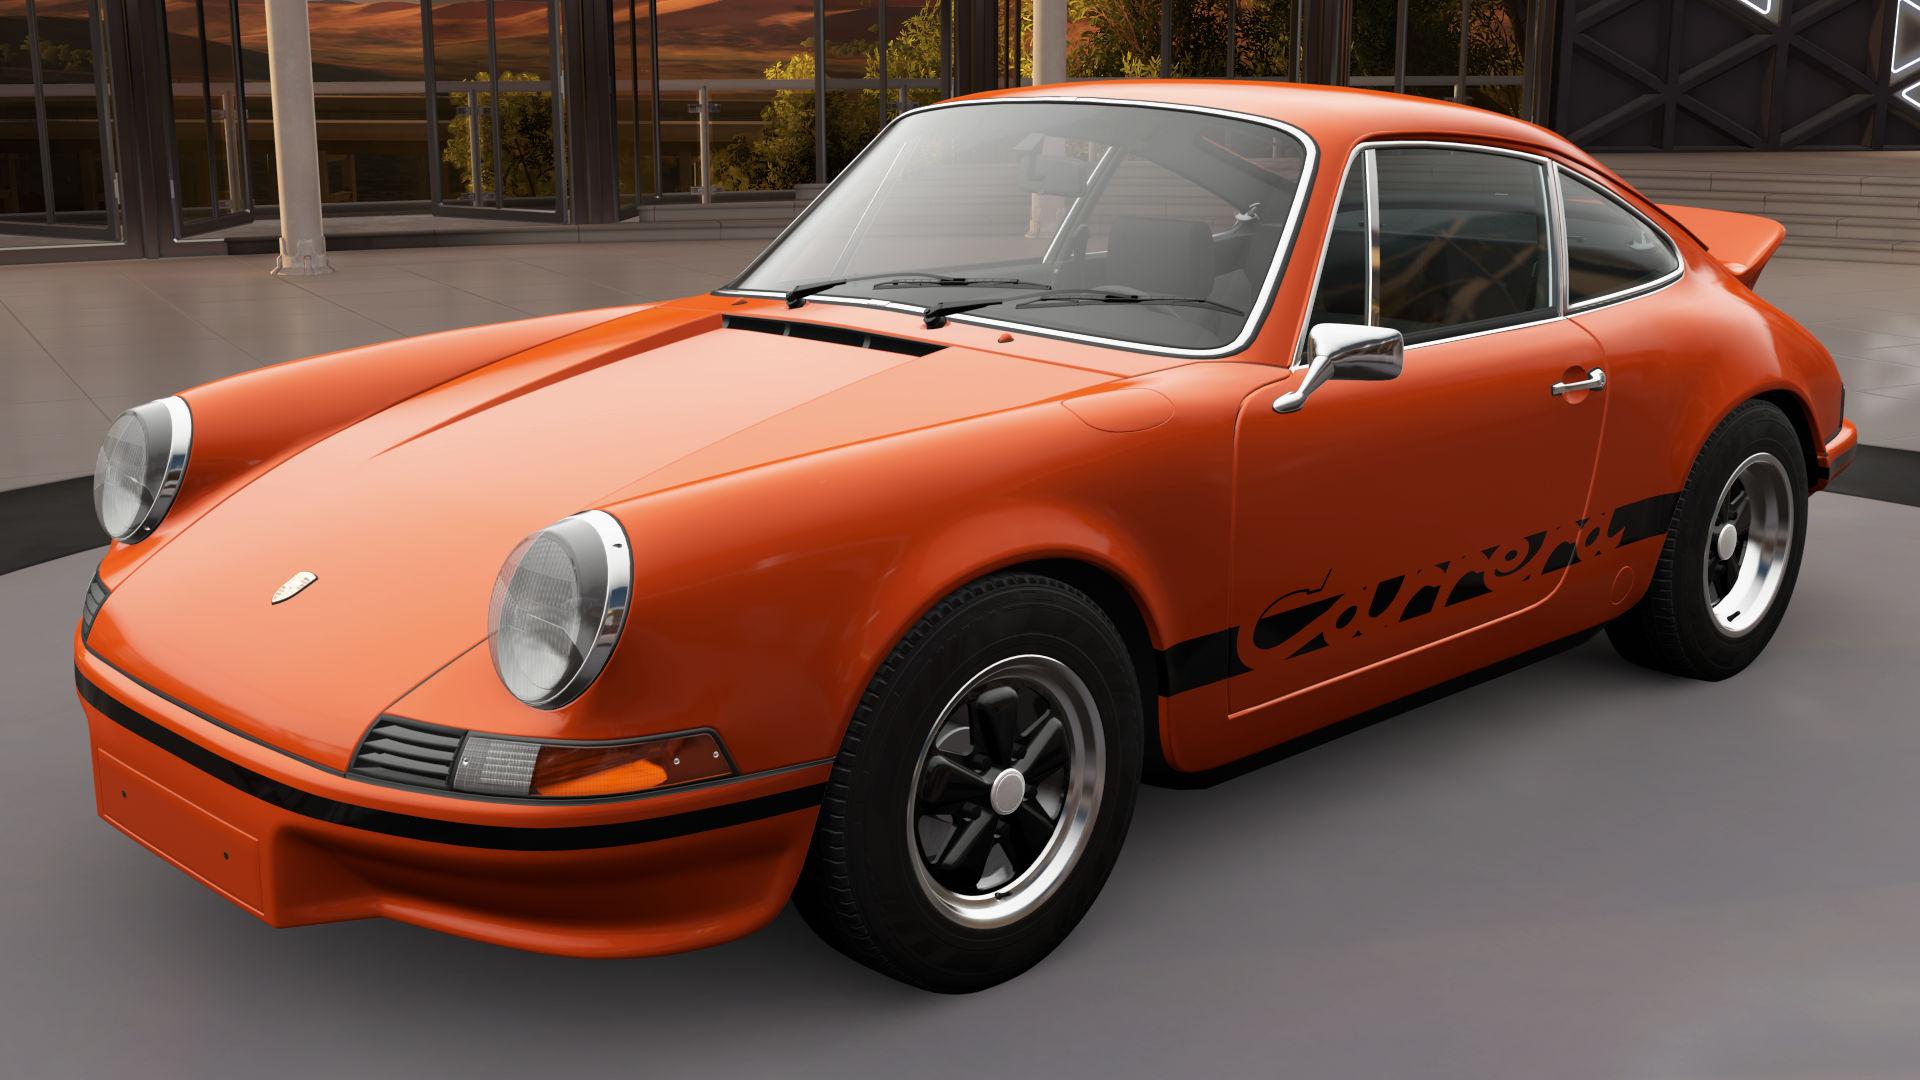 Porsche 911 turbo 1973